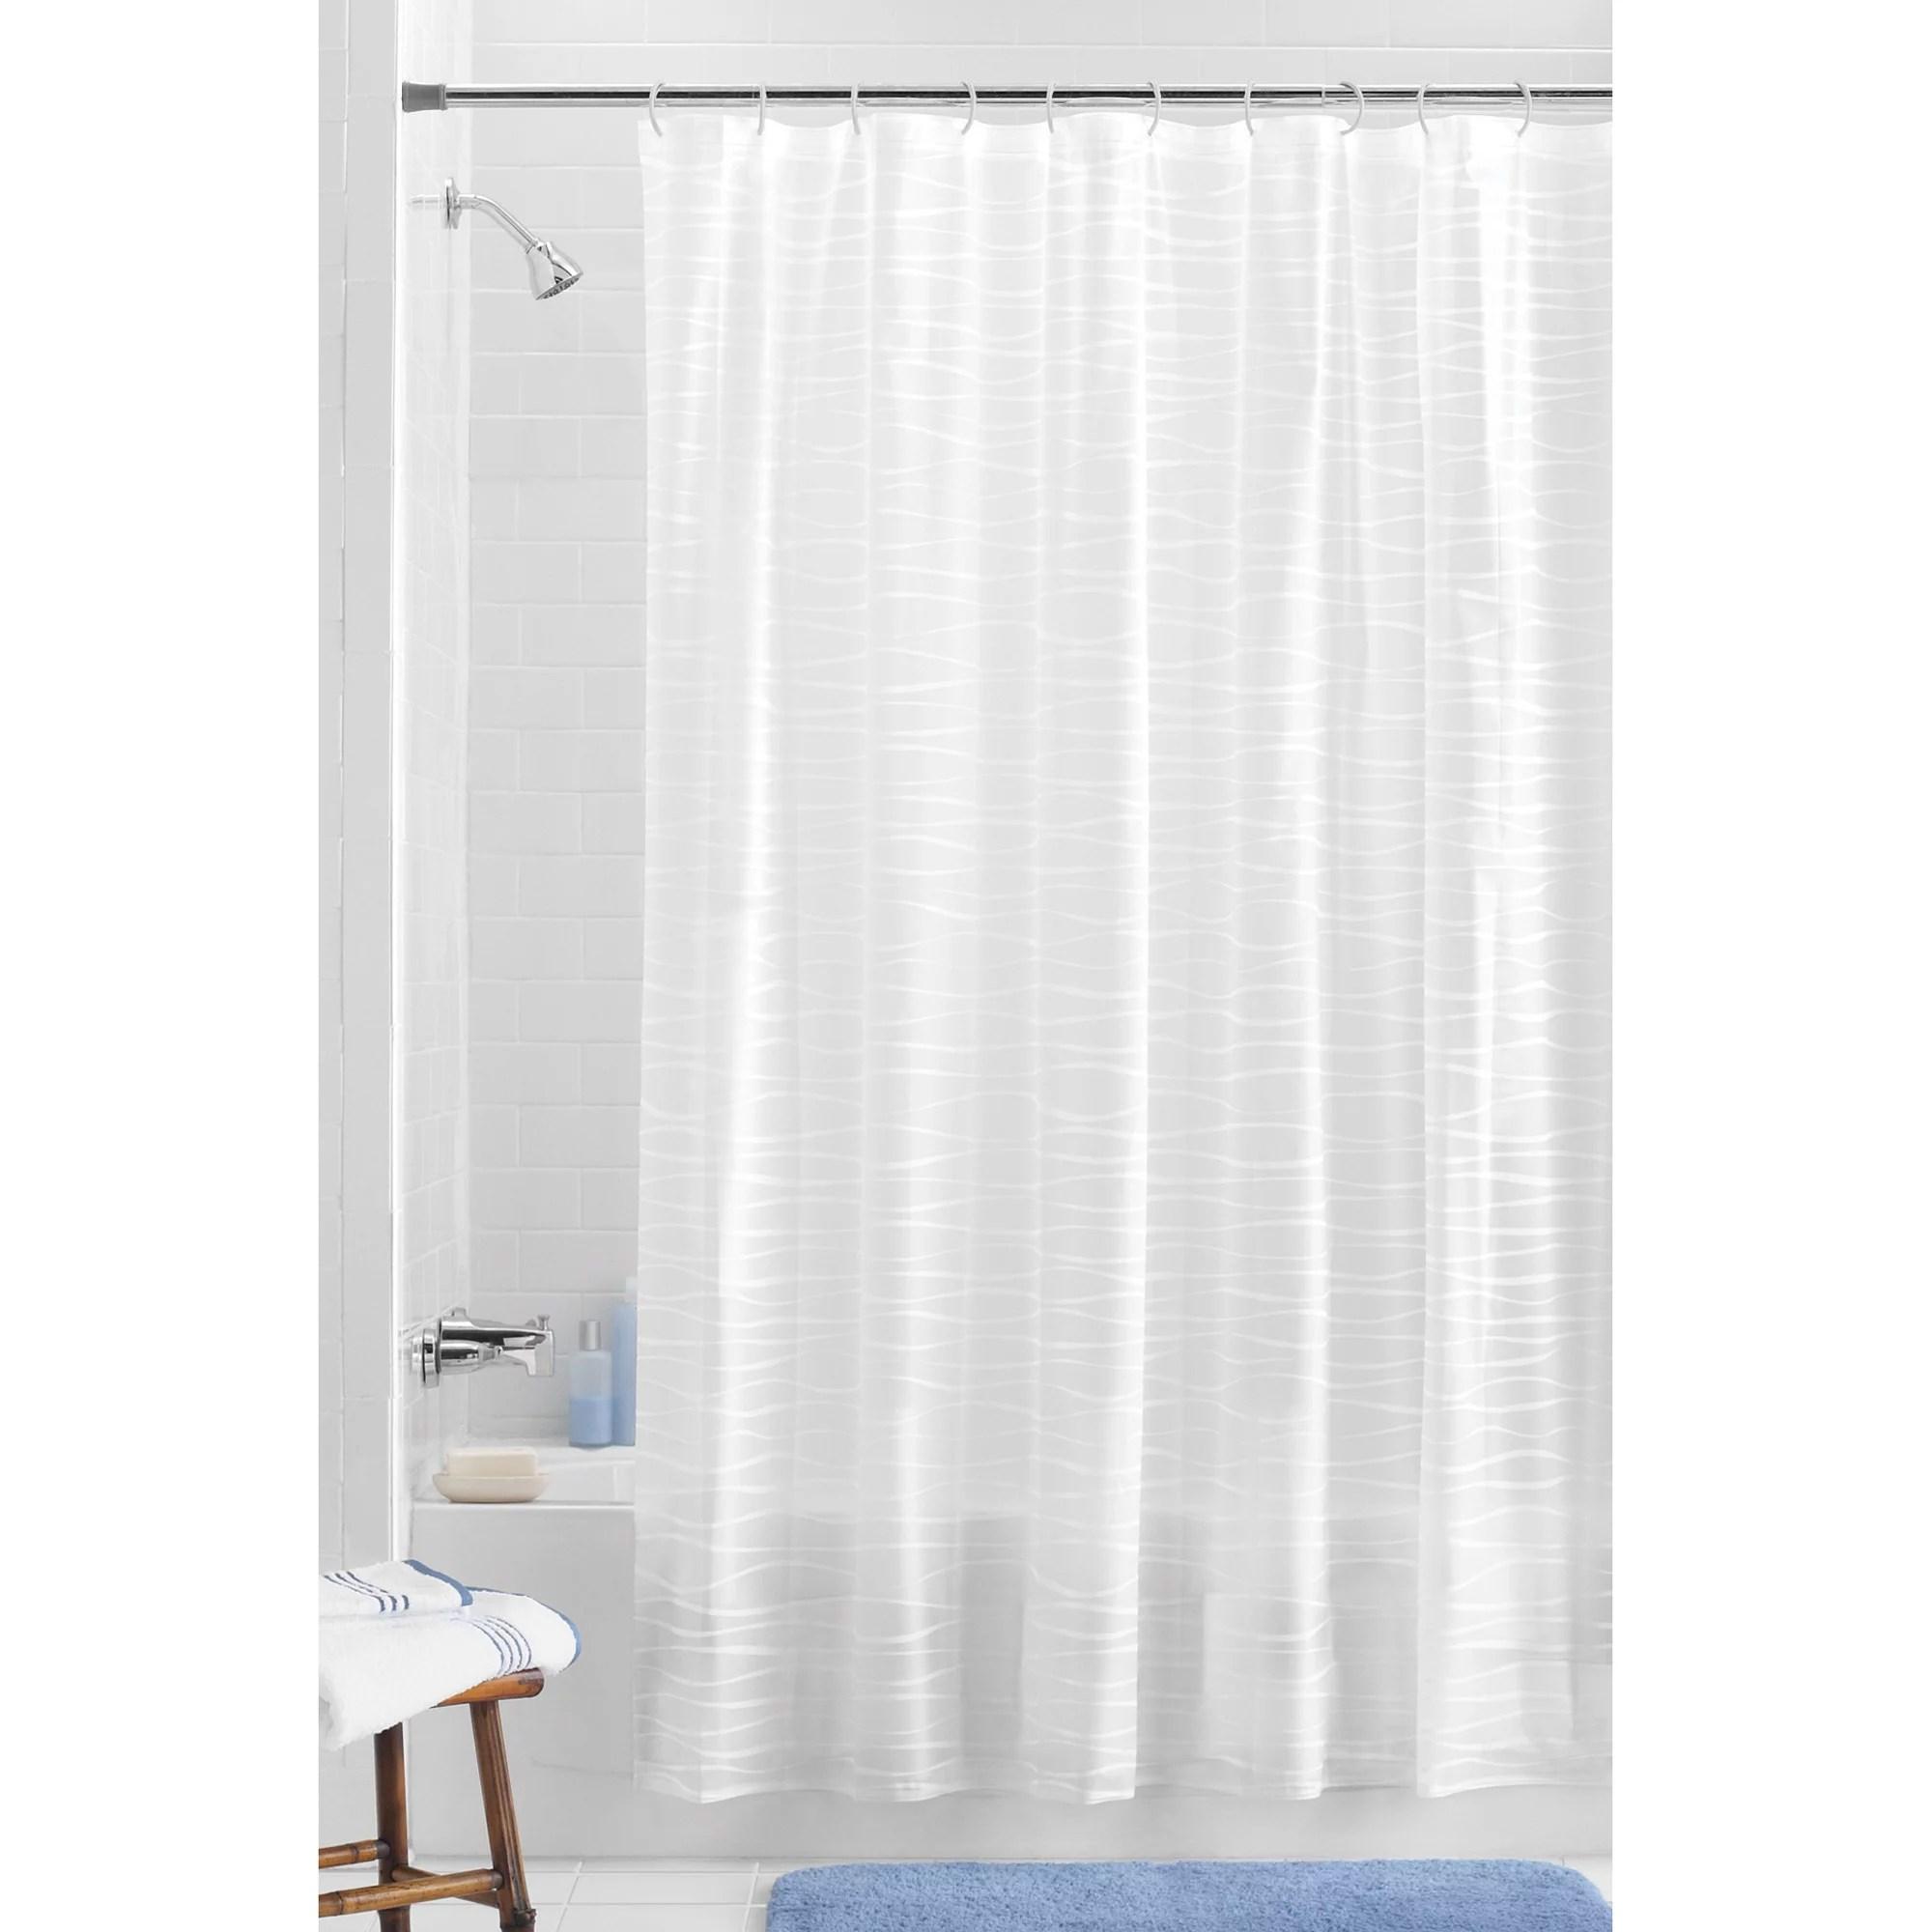 mainstays oasis peva white shower curtain 13 piece